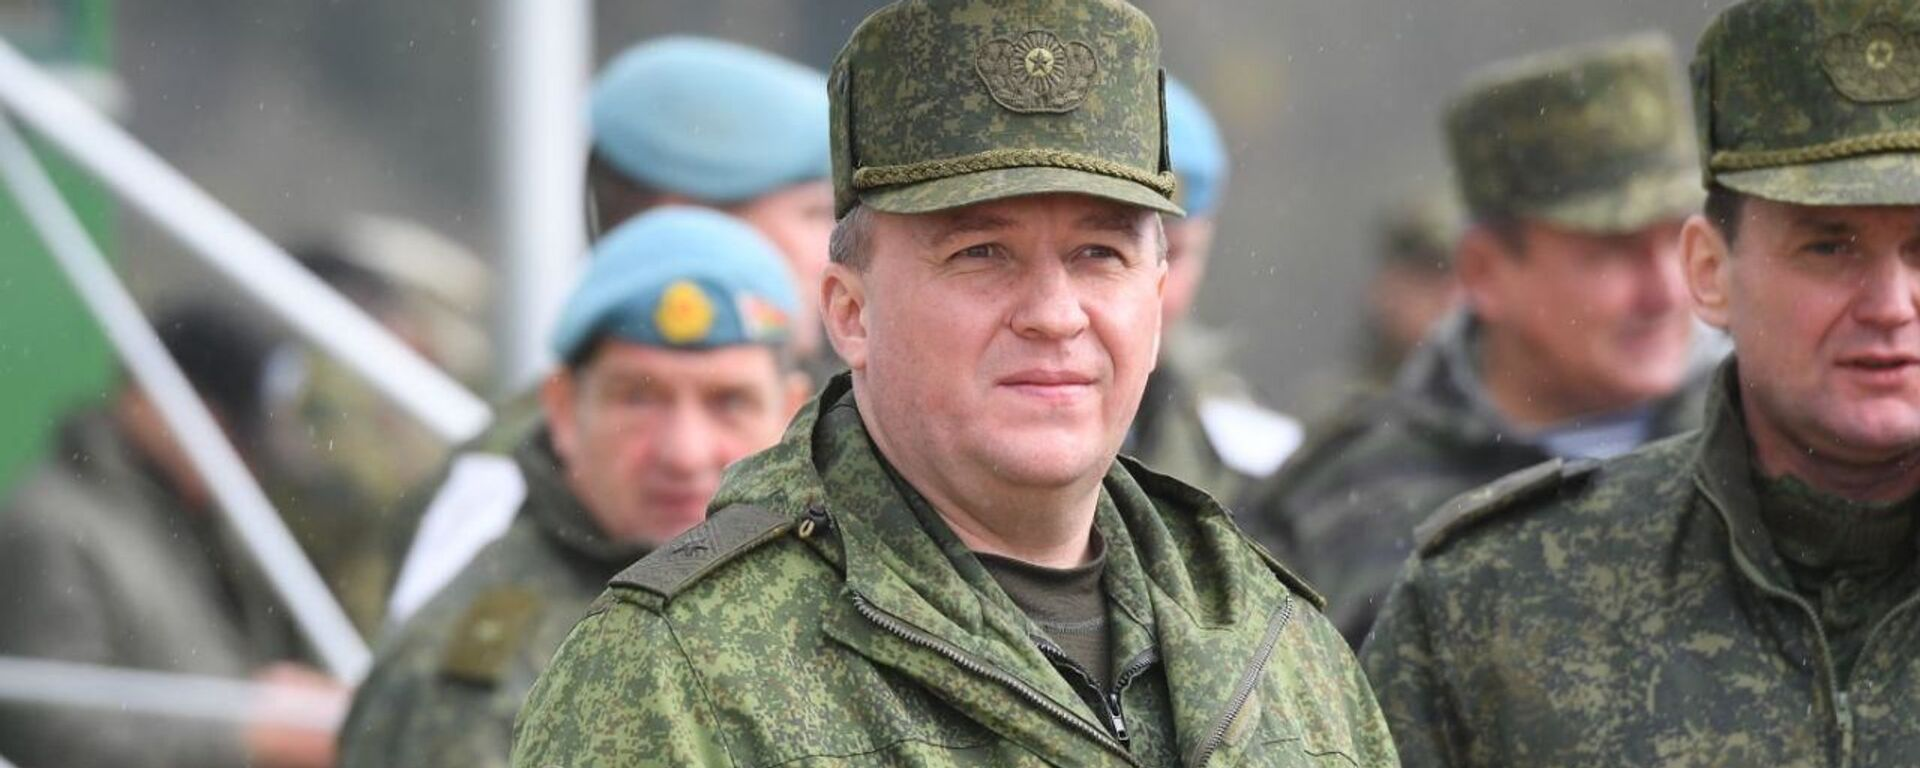 Министр обороны Беларуси Виктор Хренин - Sputnik Беларусь, 1920, 18.01.2021